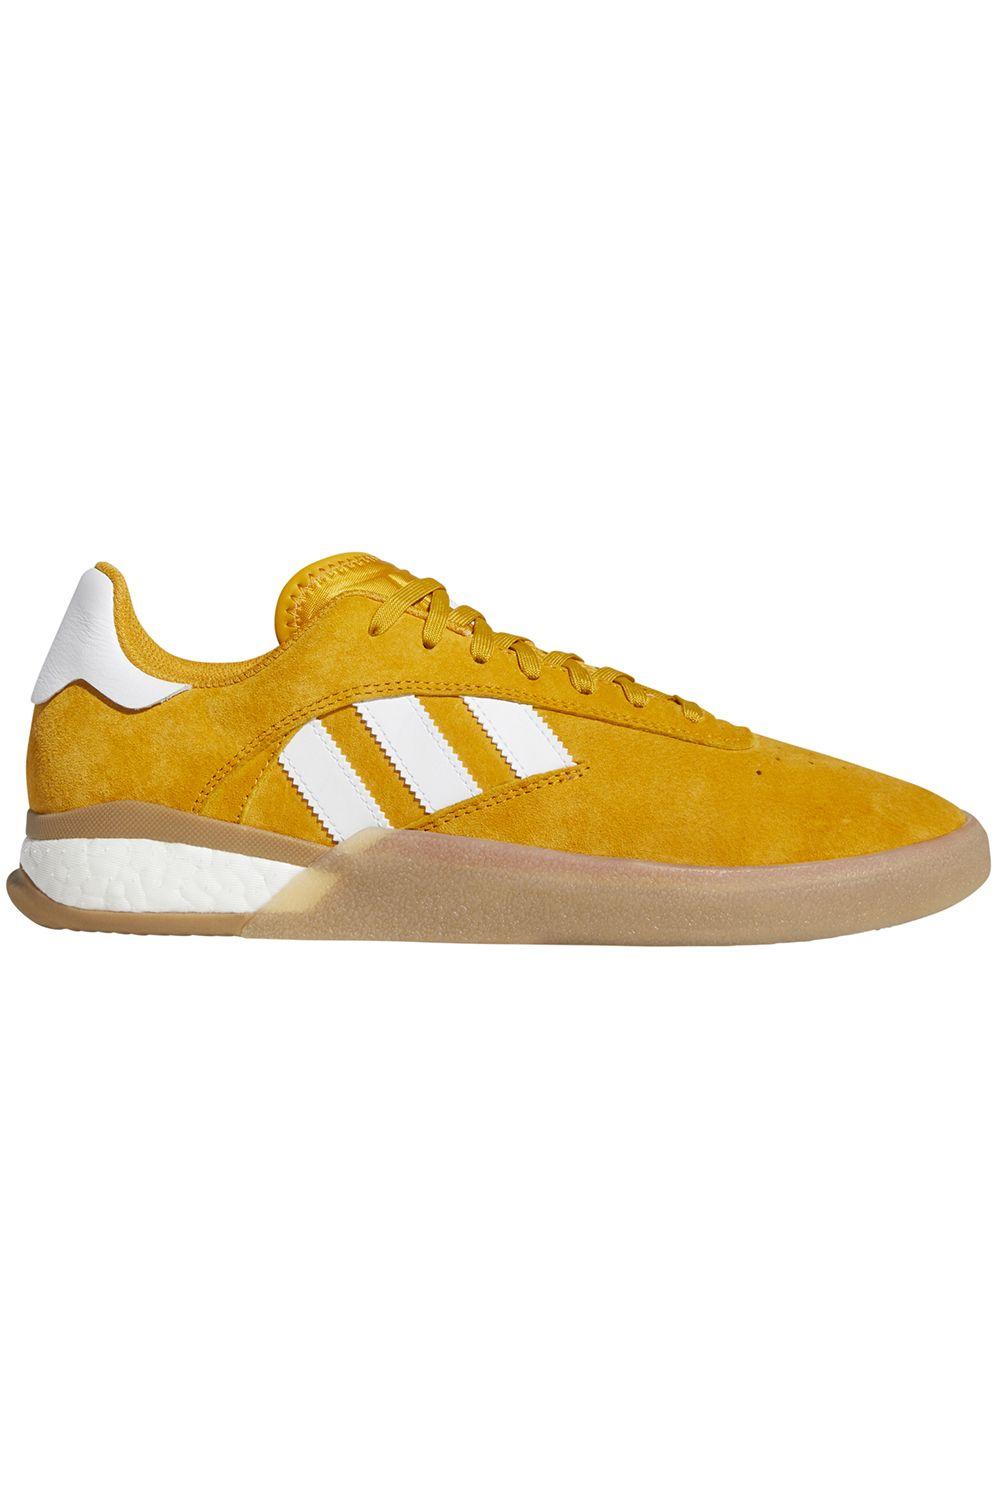 Tenis Adidas 3ST.004 Tactile Yellow F17/Ftwr White/Gum4